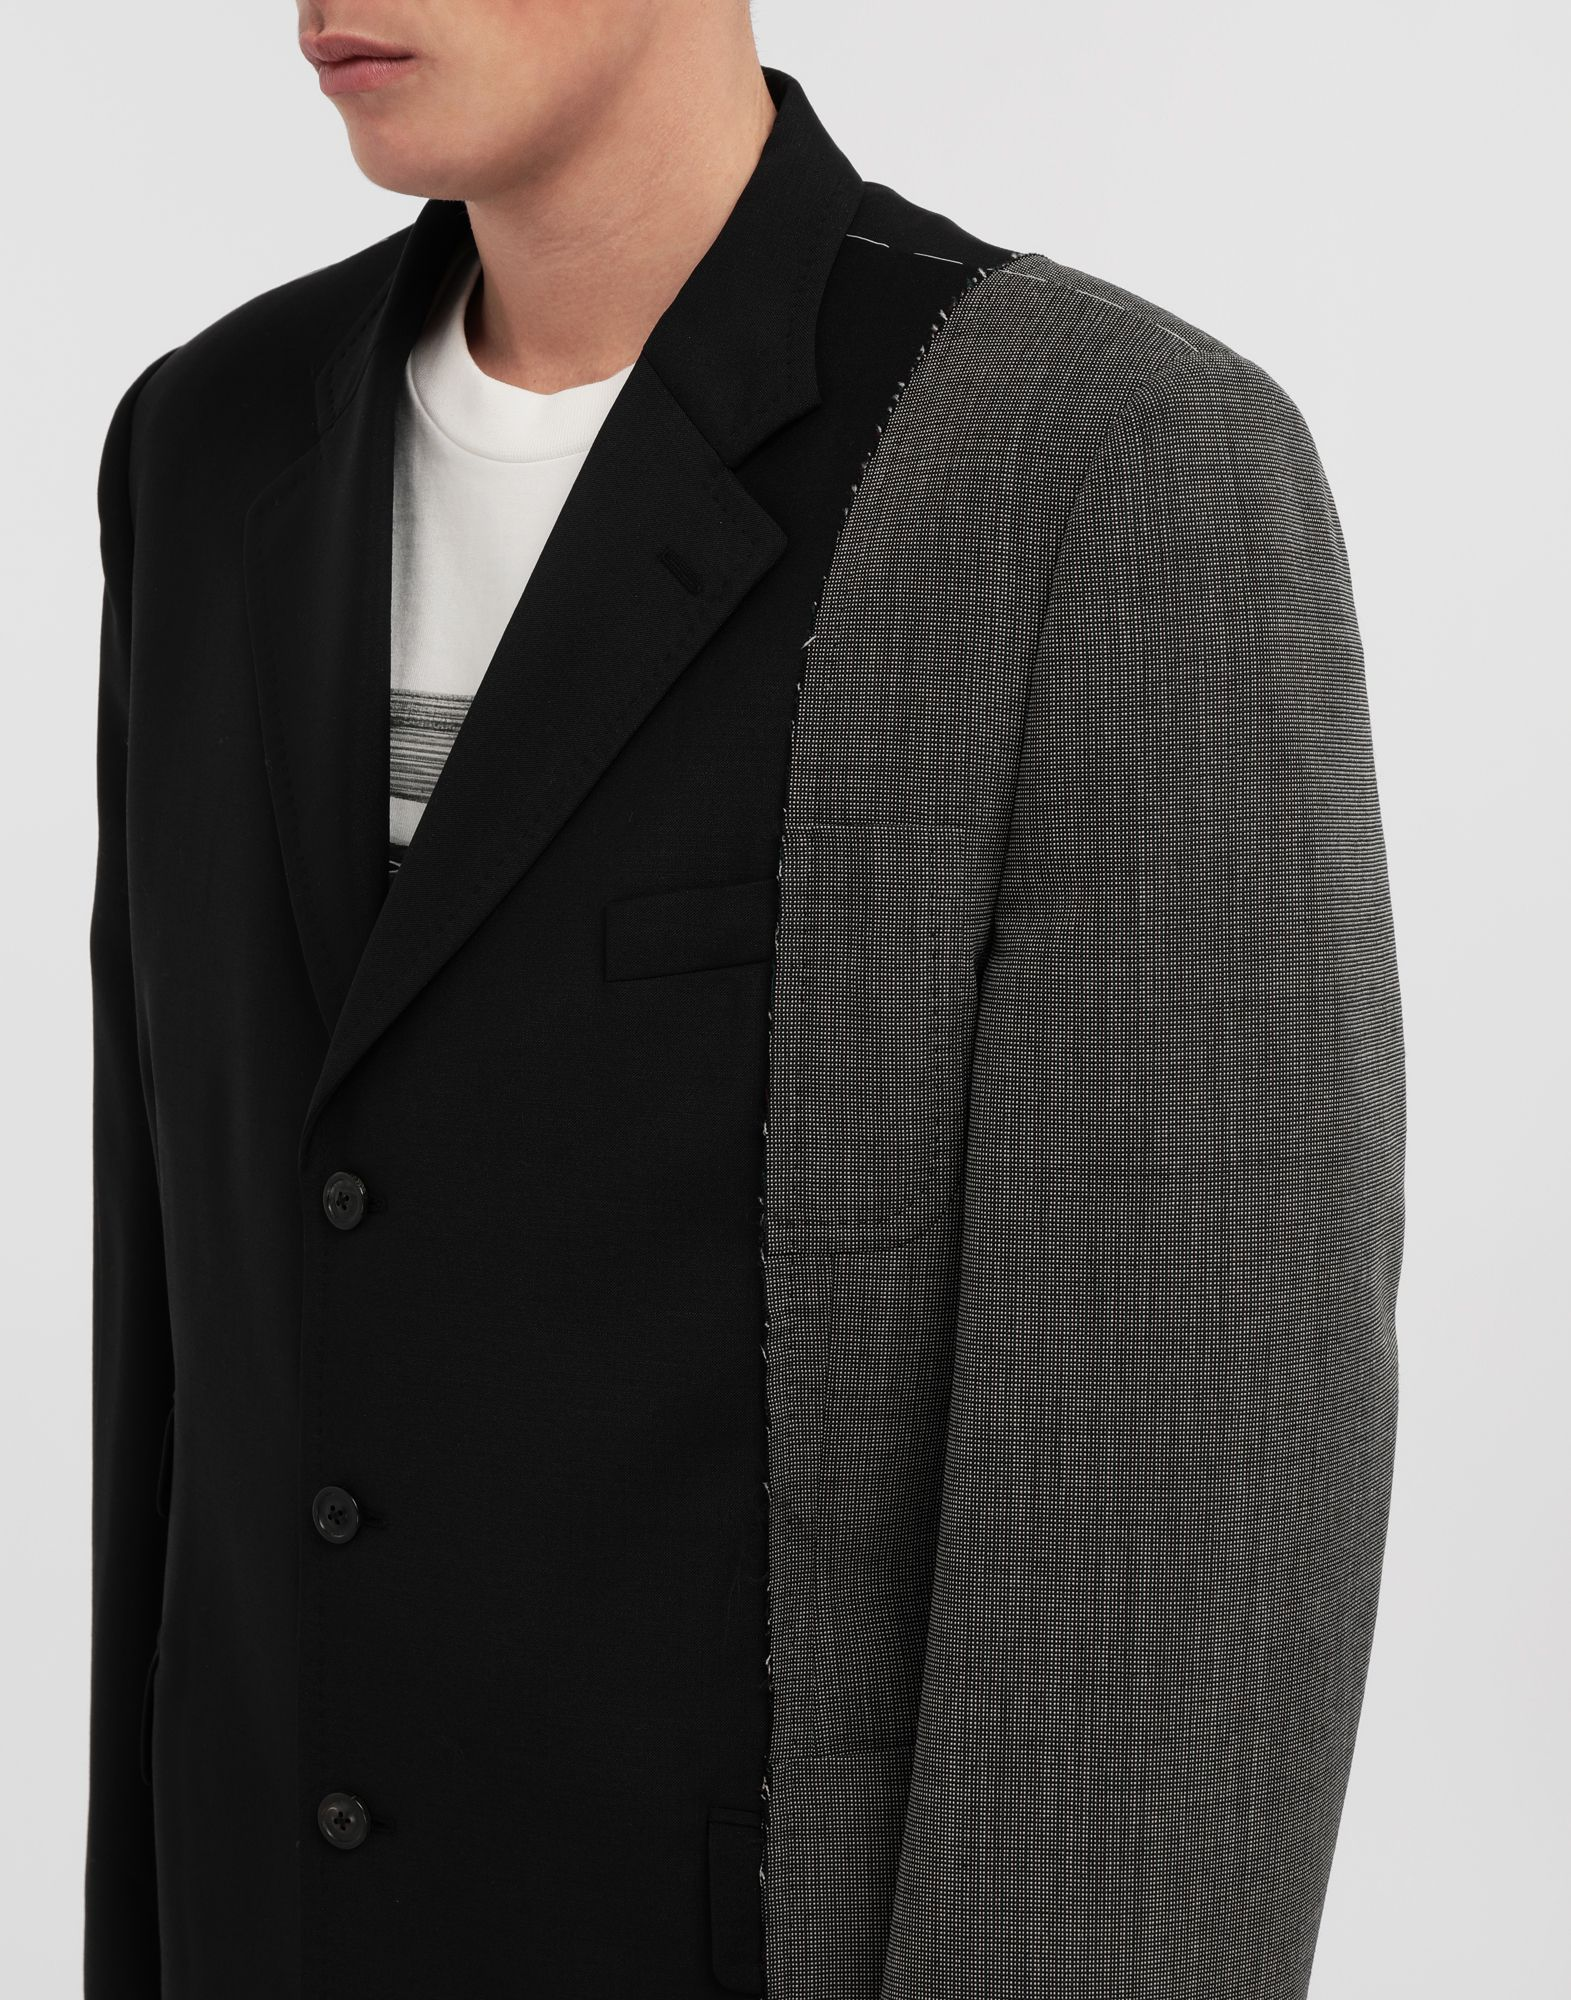 MAISON MARGIELA Spliced wool jacket Blazer Man a